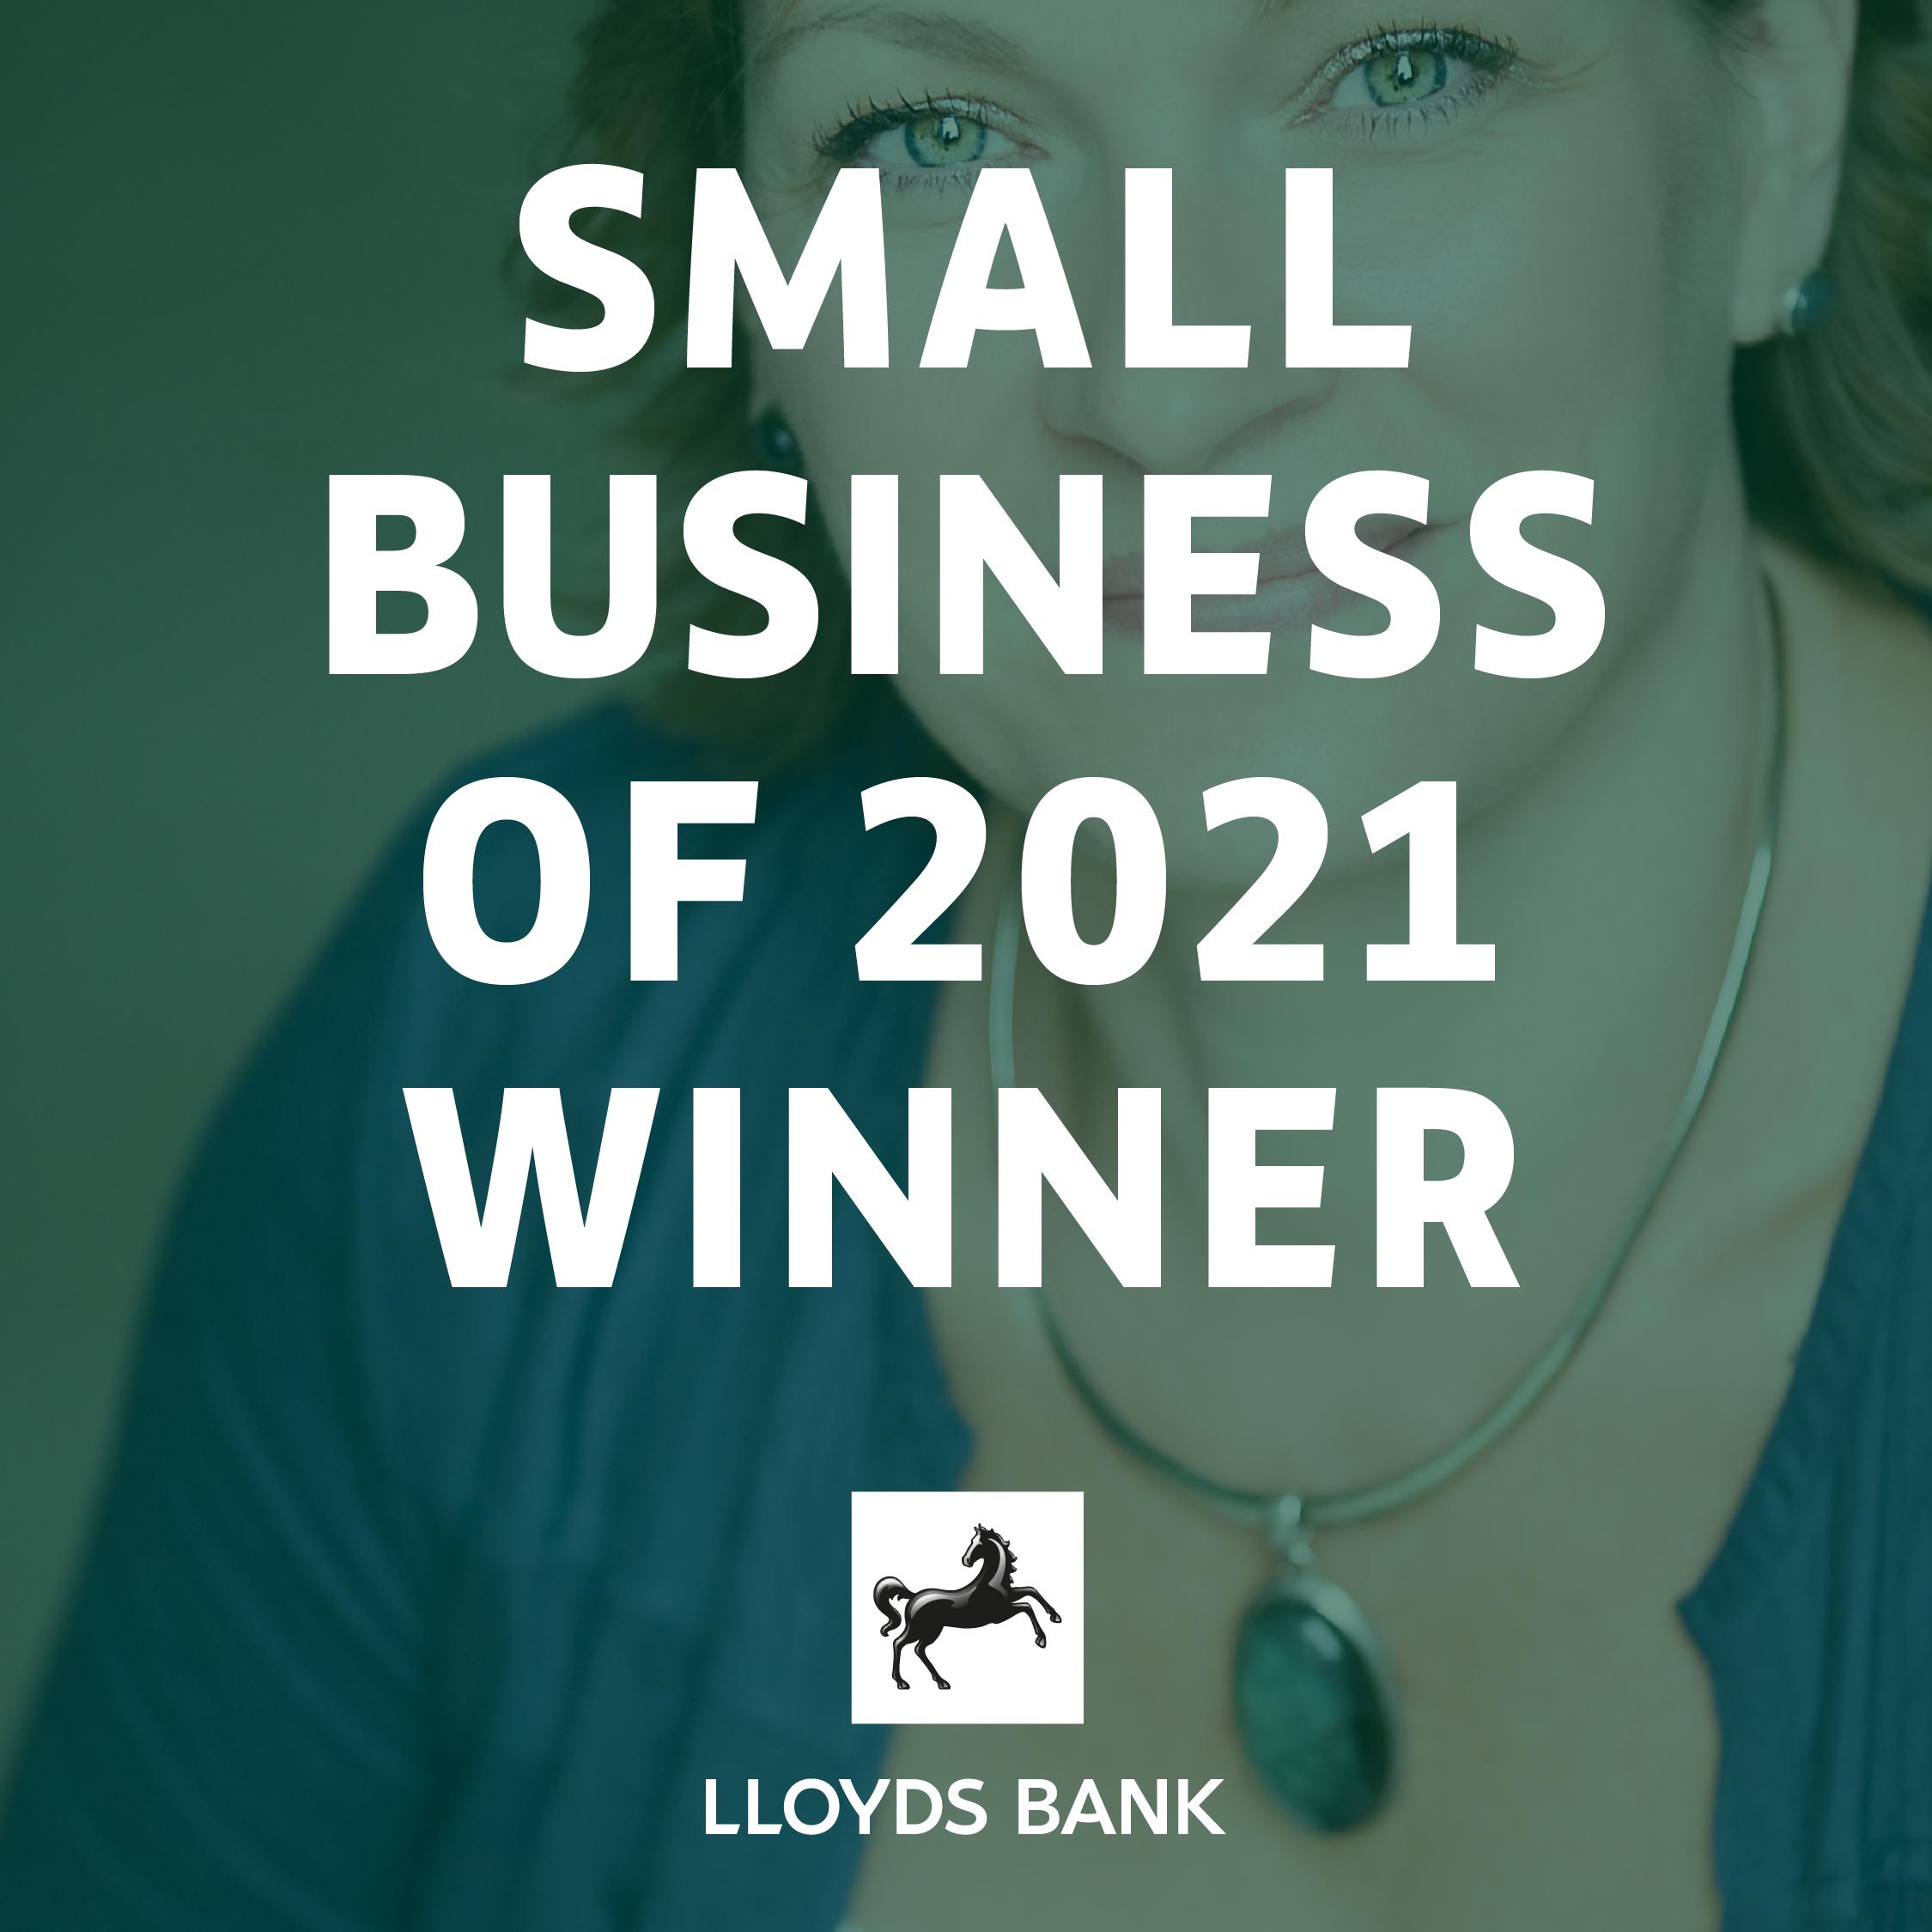 lloyds small business winner